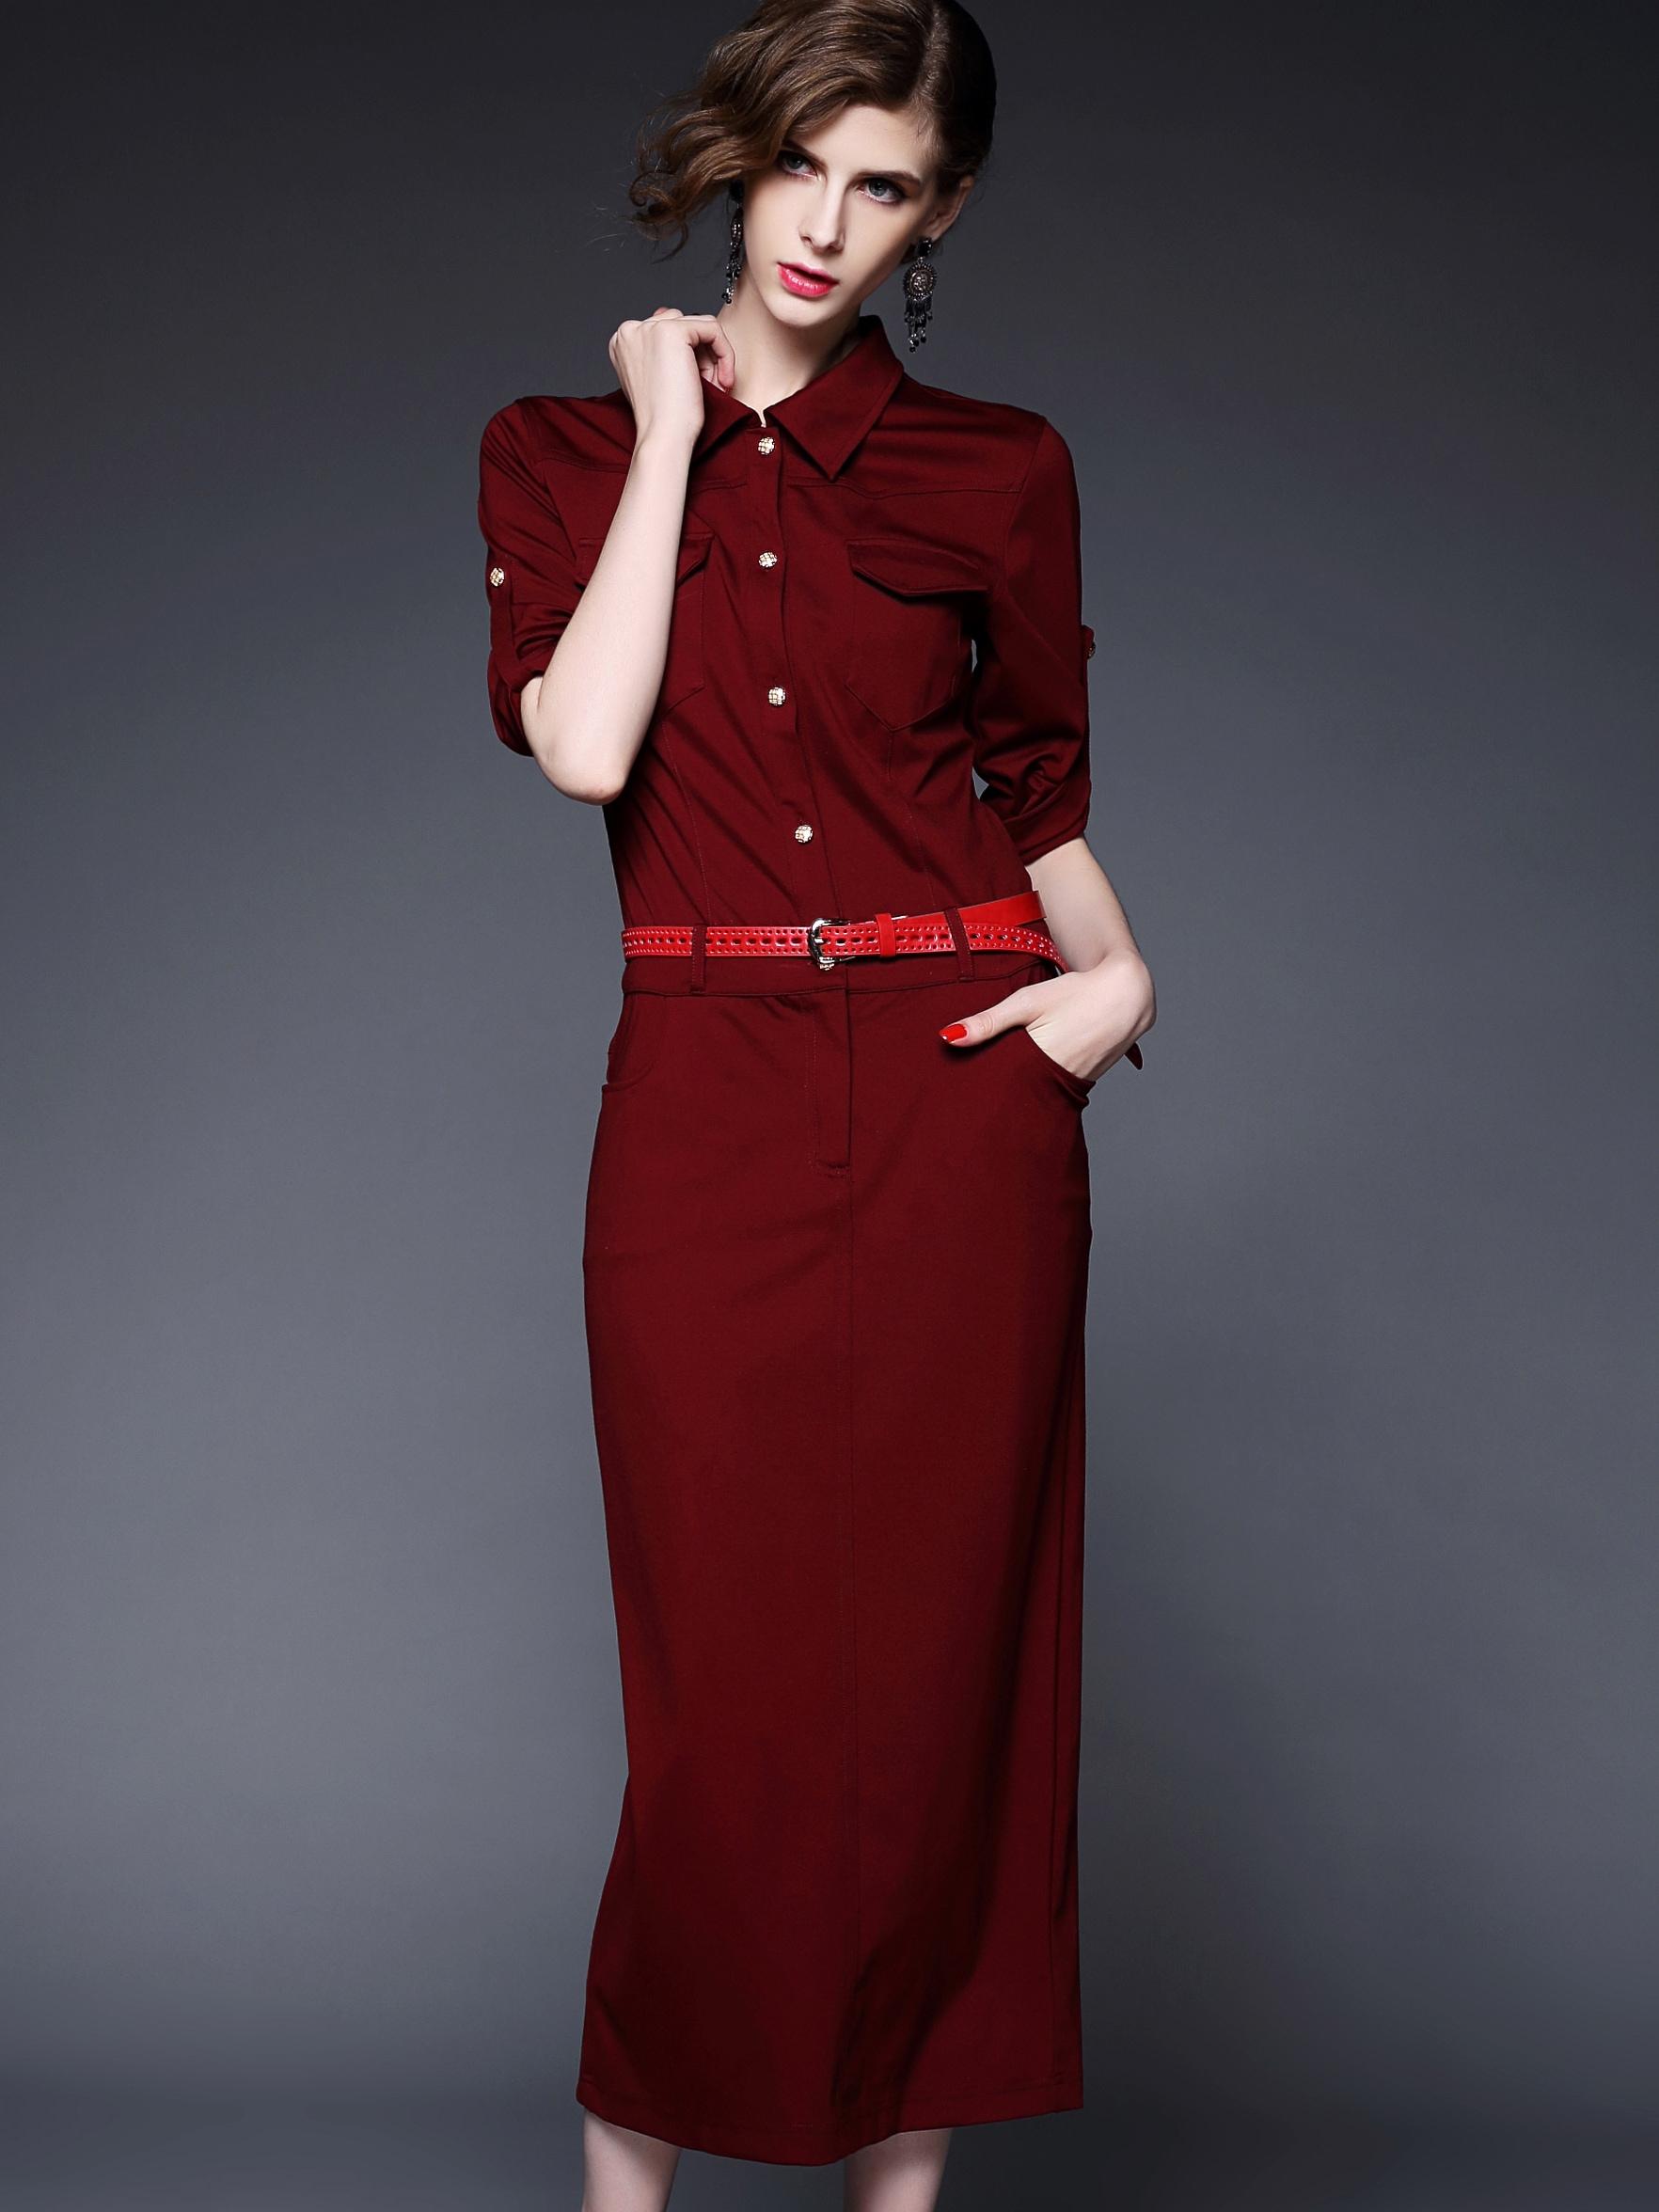 Win Red Round Neck Half Sleeve Drawstring Pockets Dress